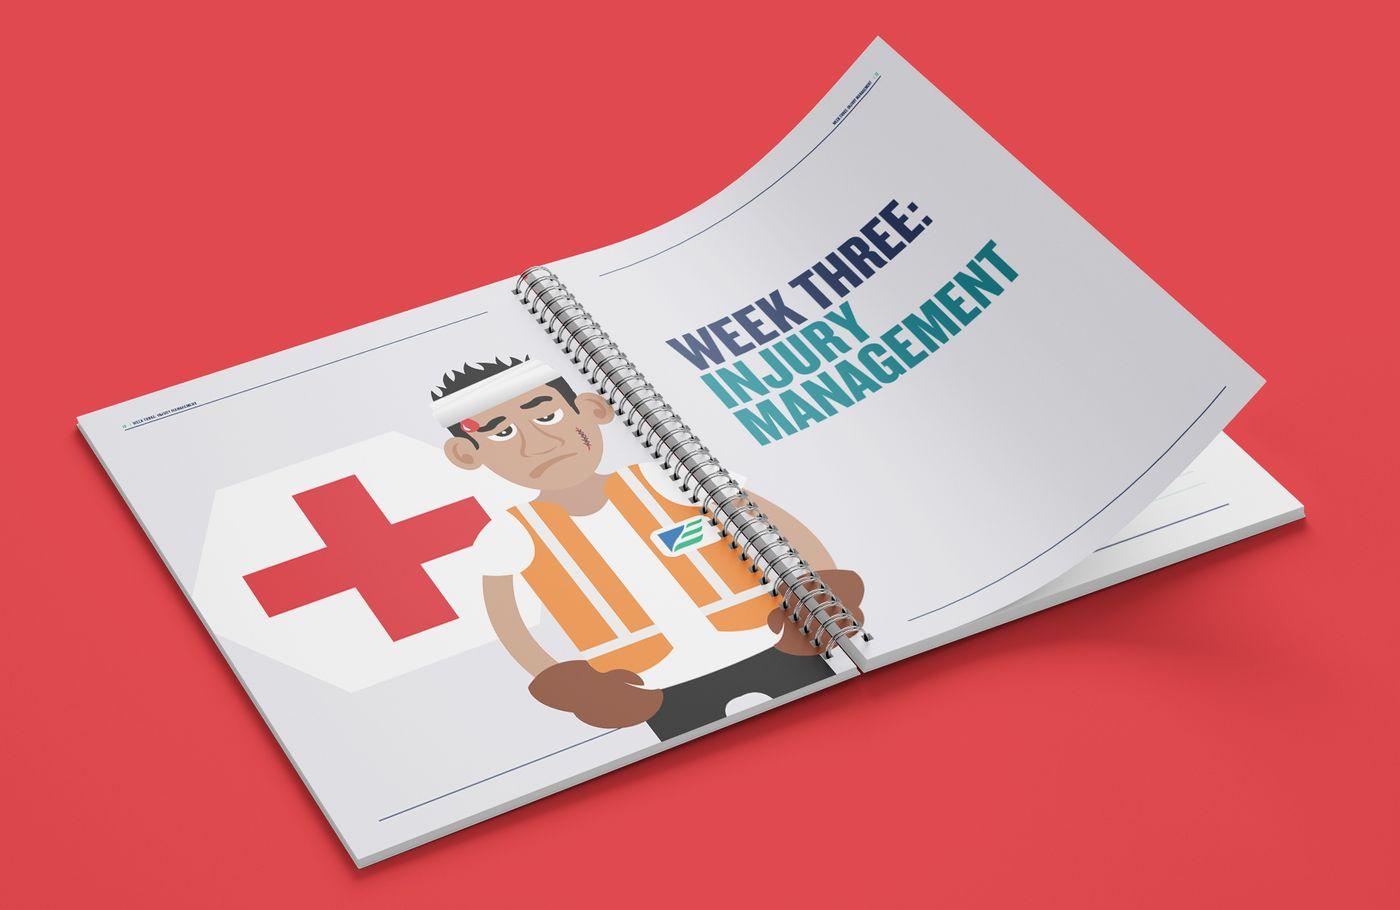 EnviroWaste Saftey Work Book Injury